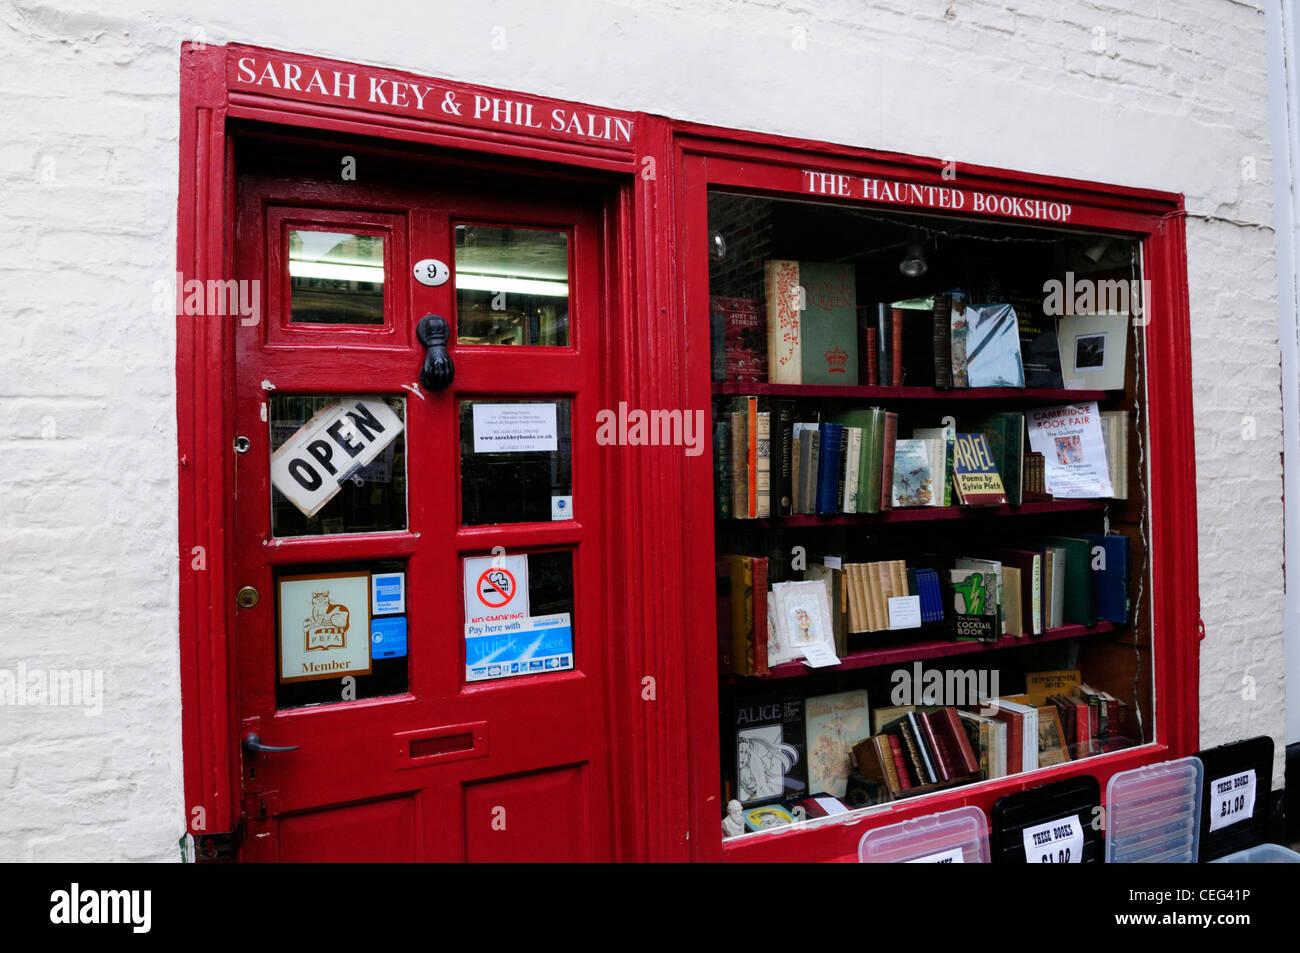 El Haunted Bookshop, St Edward's Passage, Cambridge, Inglaterra, Reino Unido. Imagen De Stock